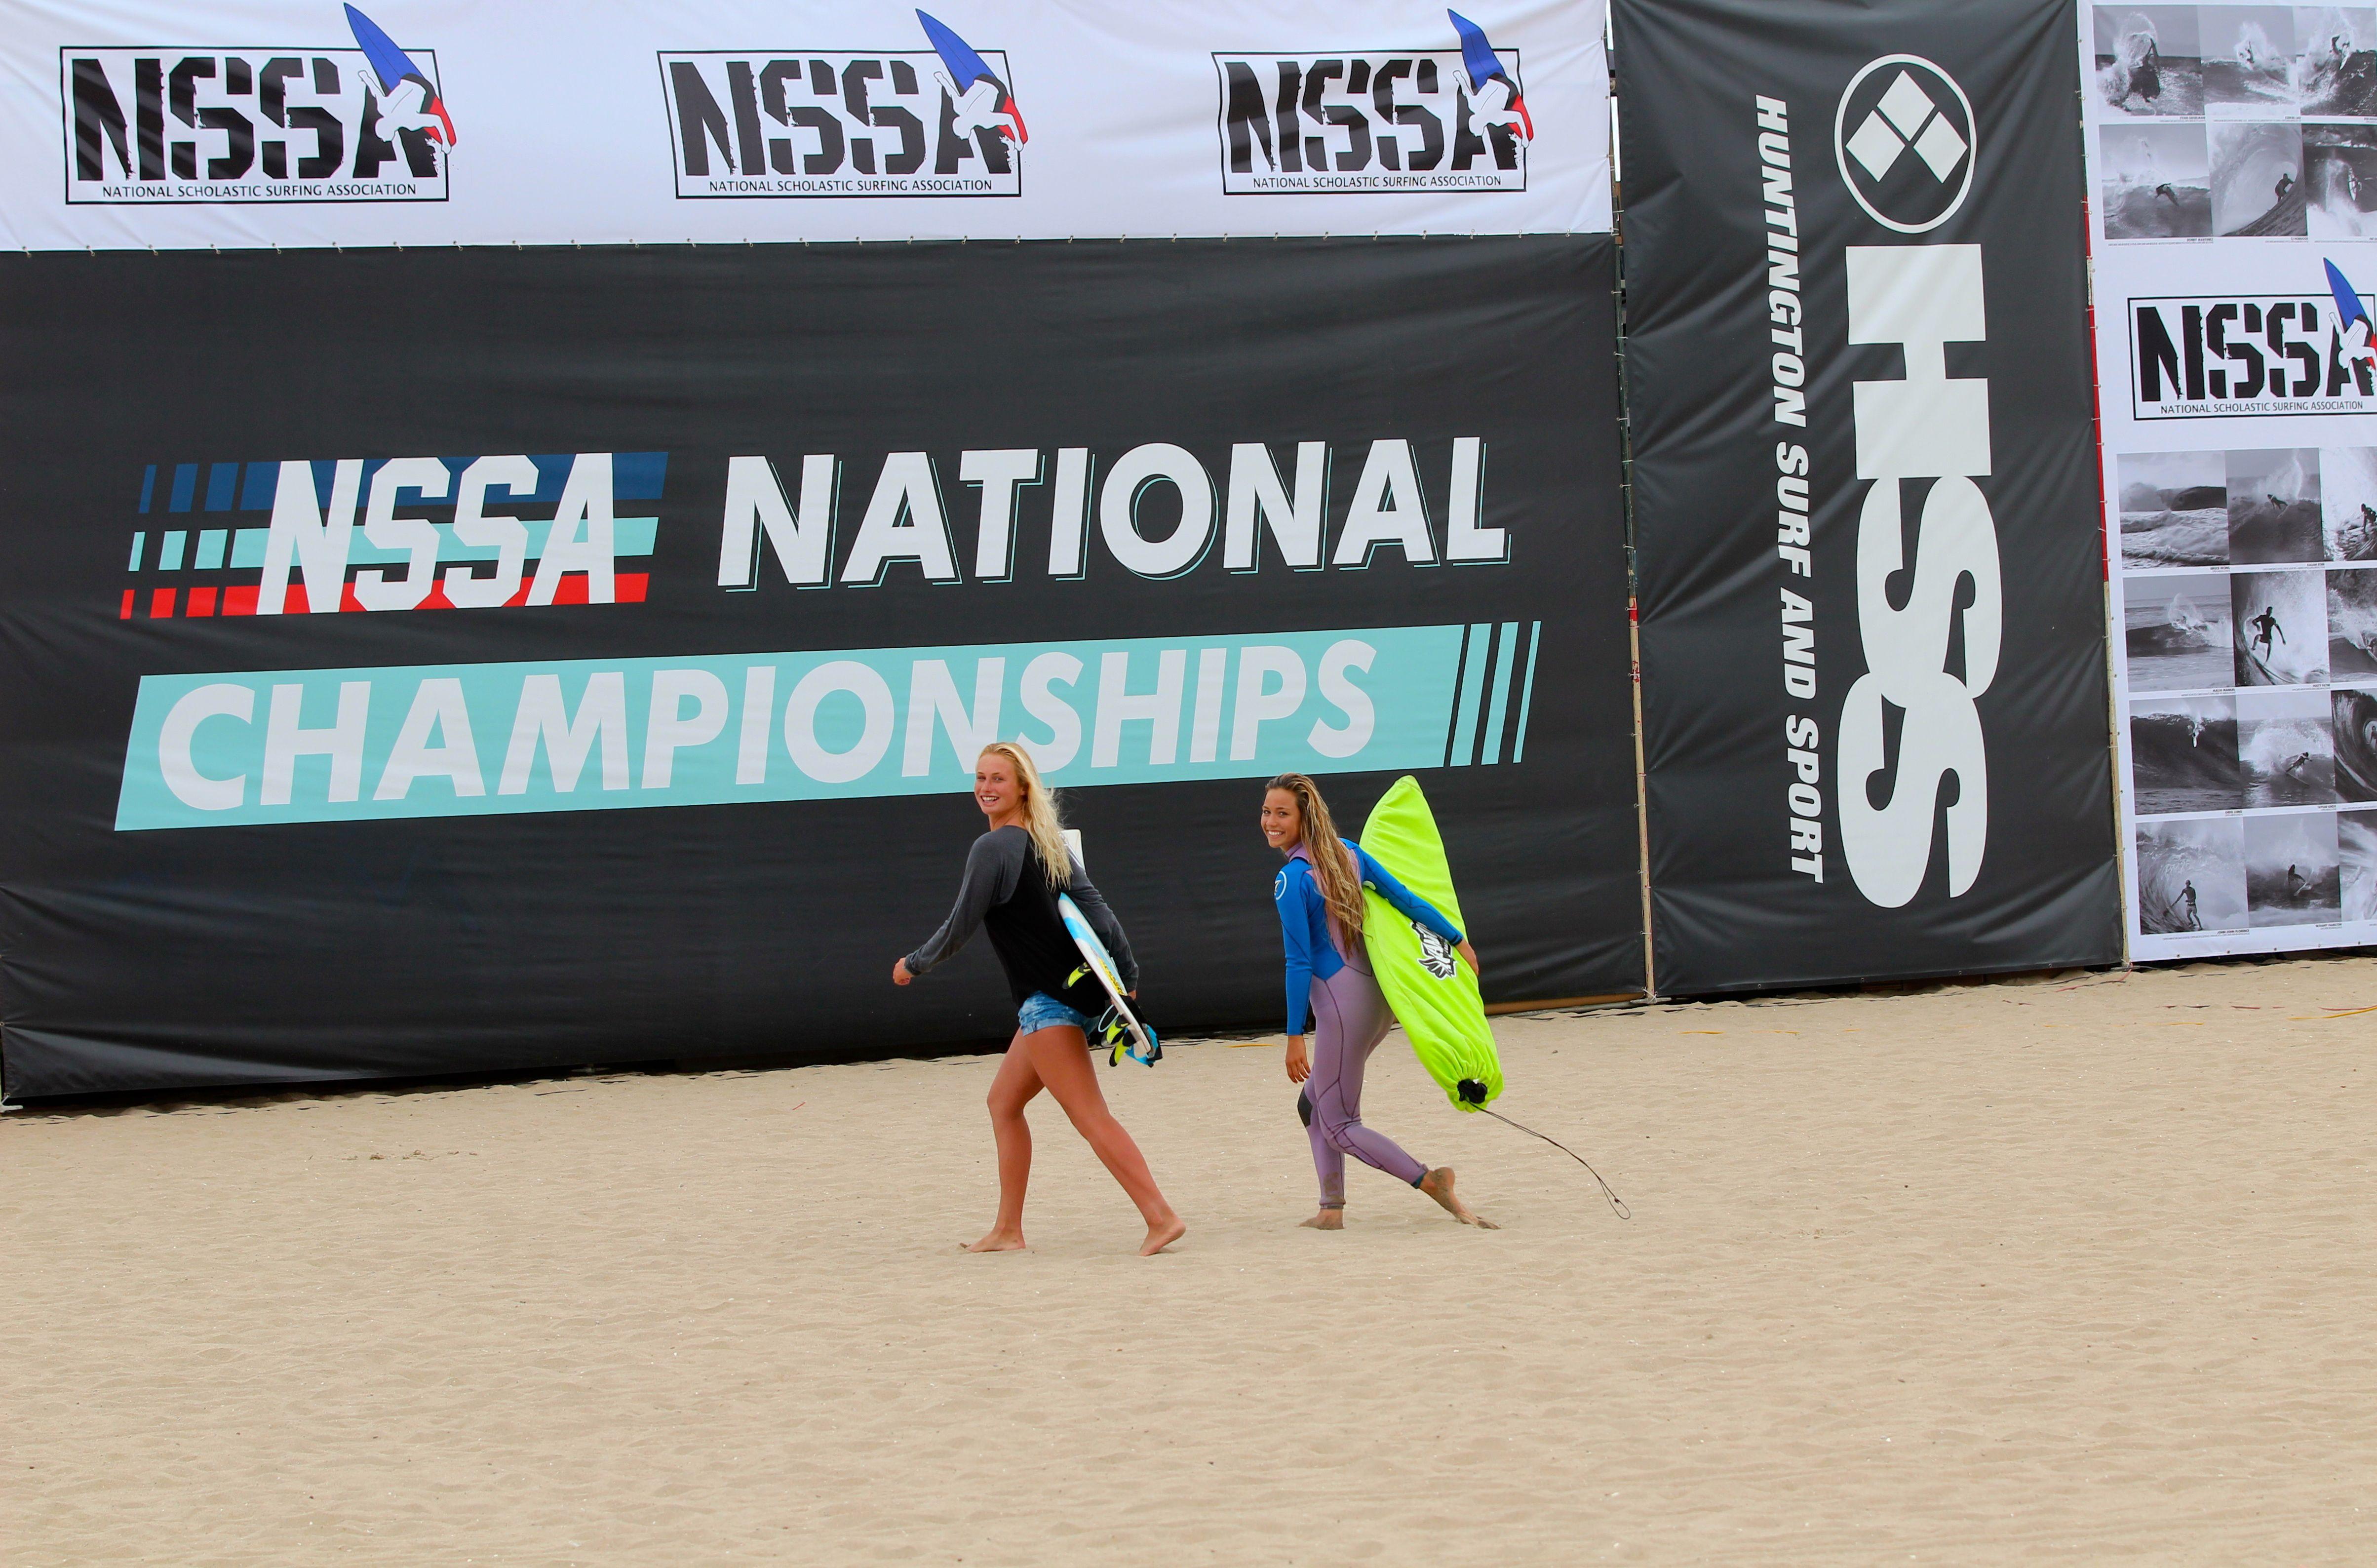 Volcom Surfers Dax Mcgill And Tia Blanco At Nssa In Huntington Beach